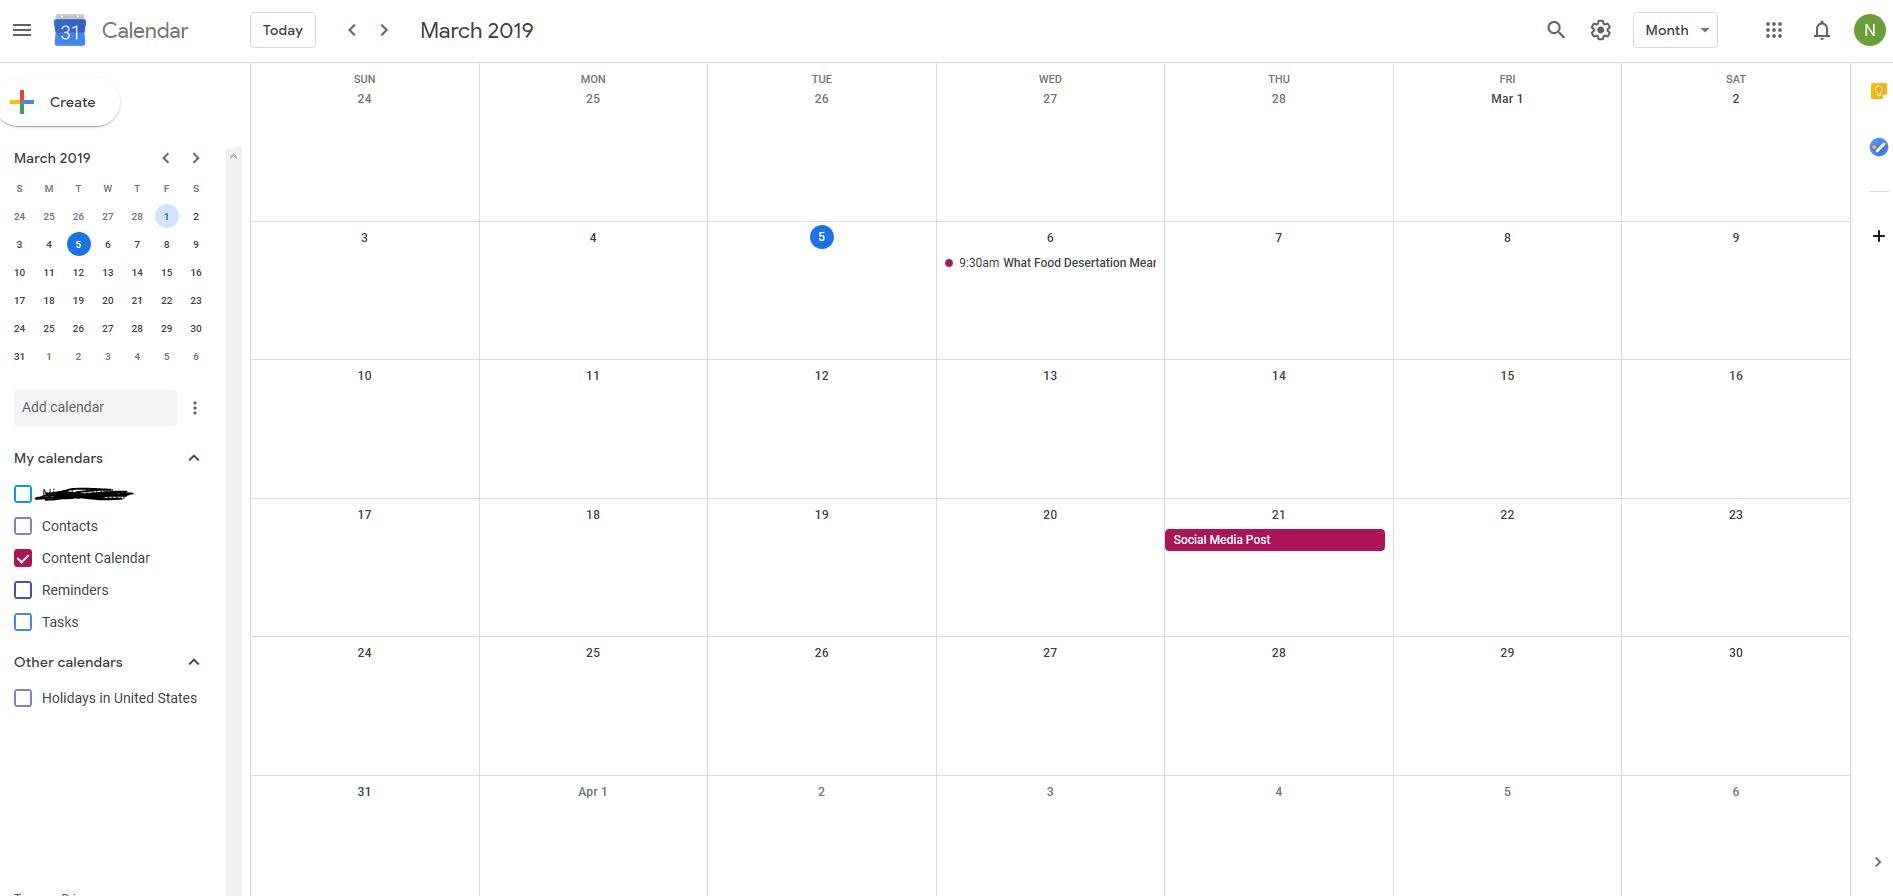 A content calendar in Google Calendar